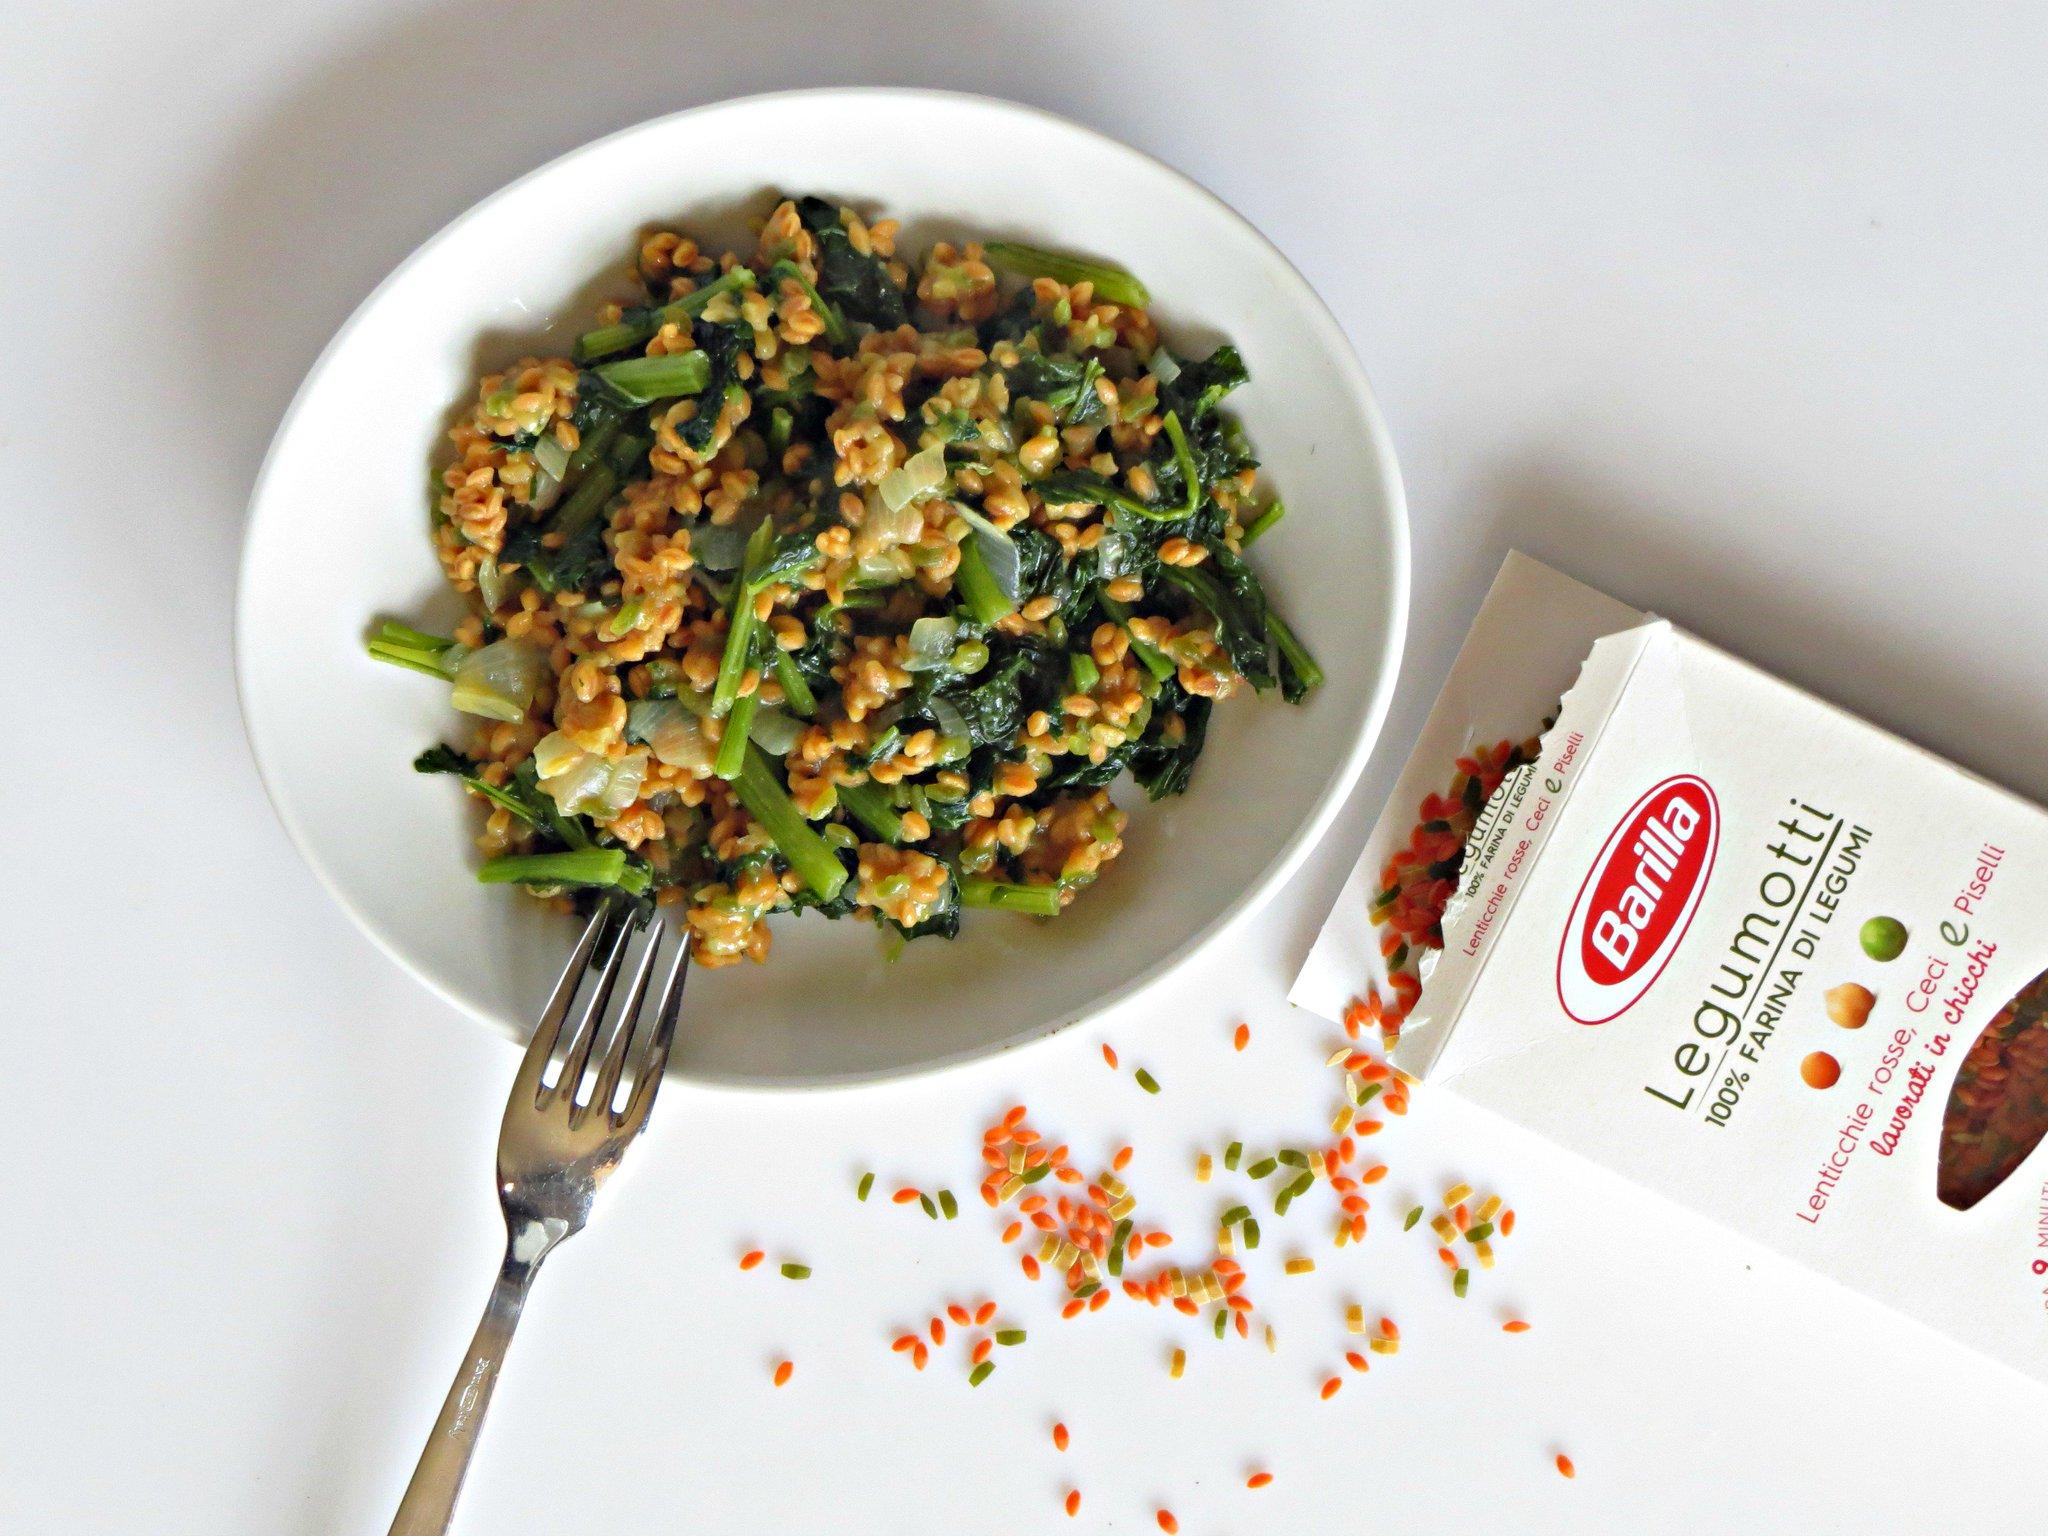 Bellettoblog on twitter i legumotti novit per chi ama for Ricette barilla